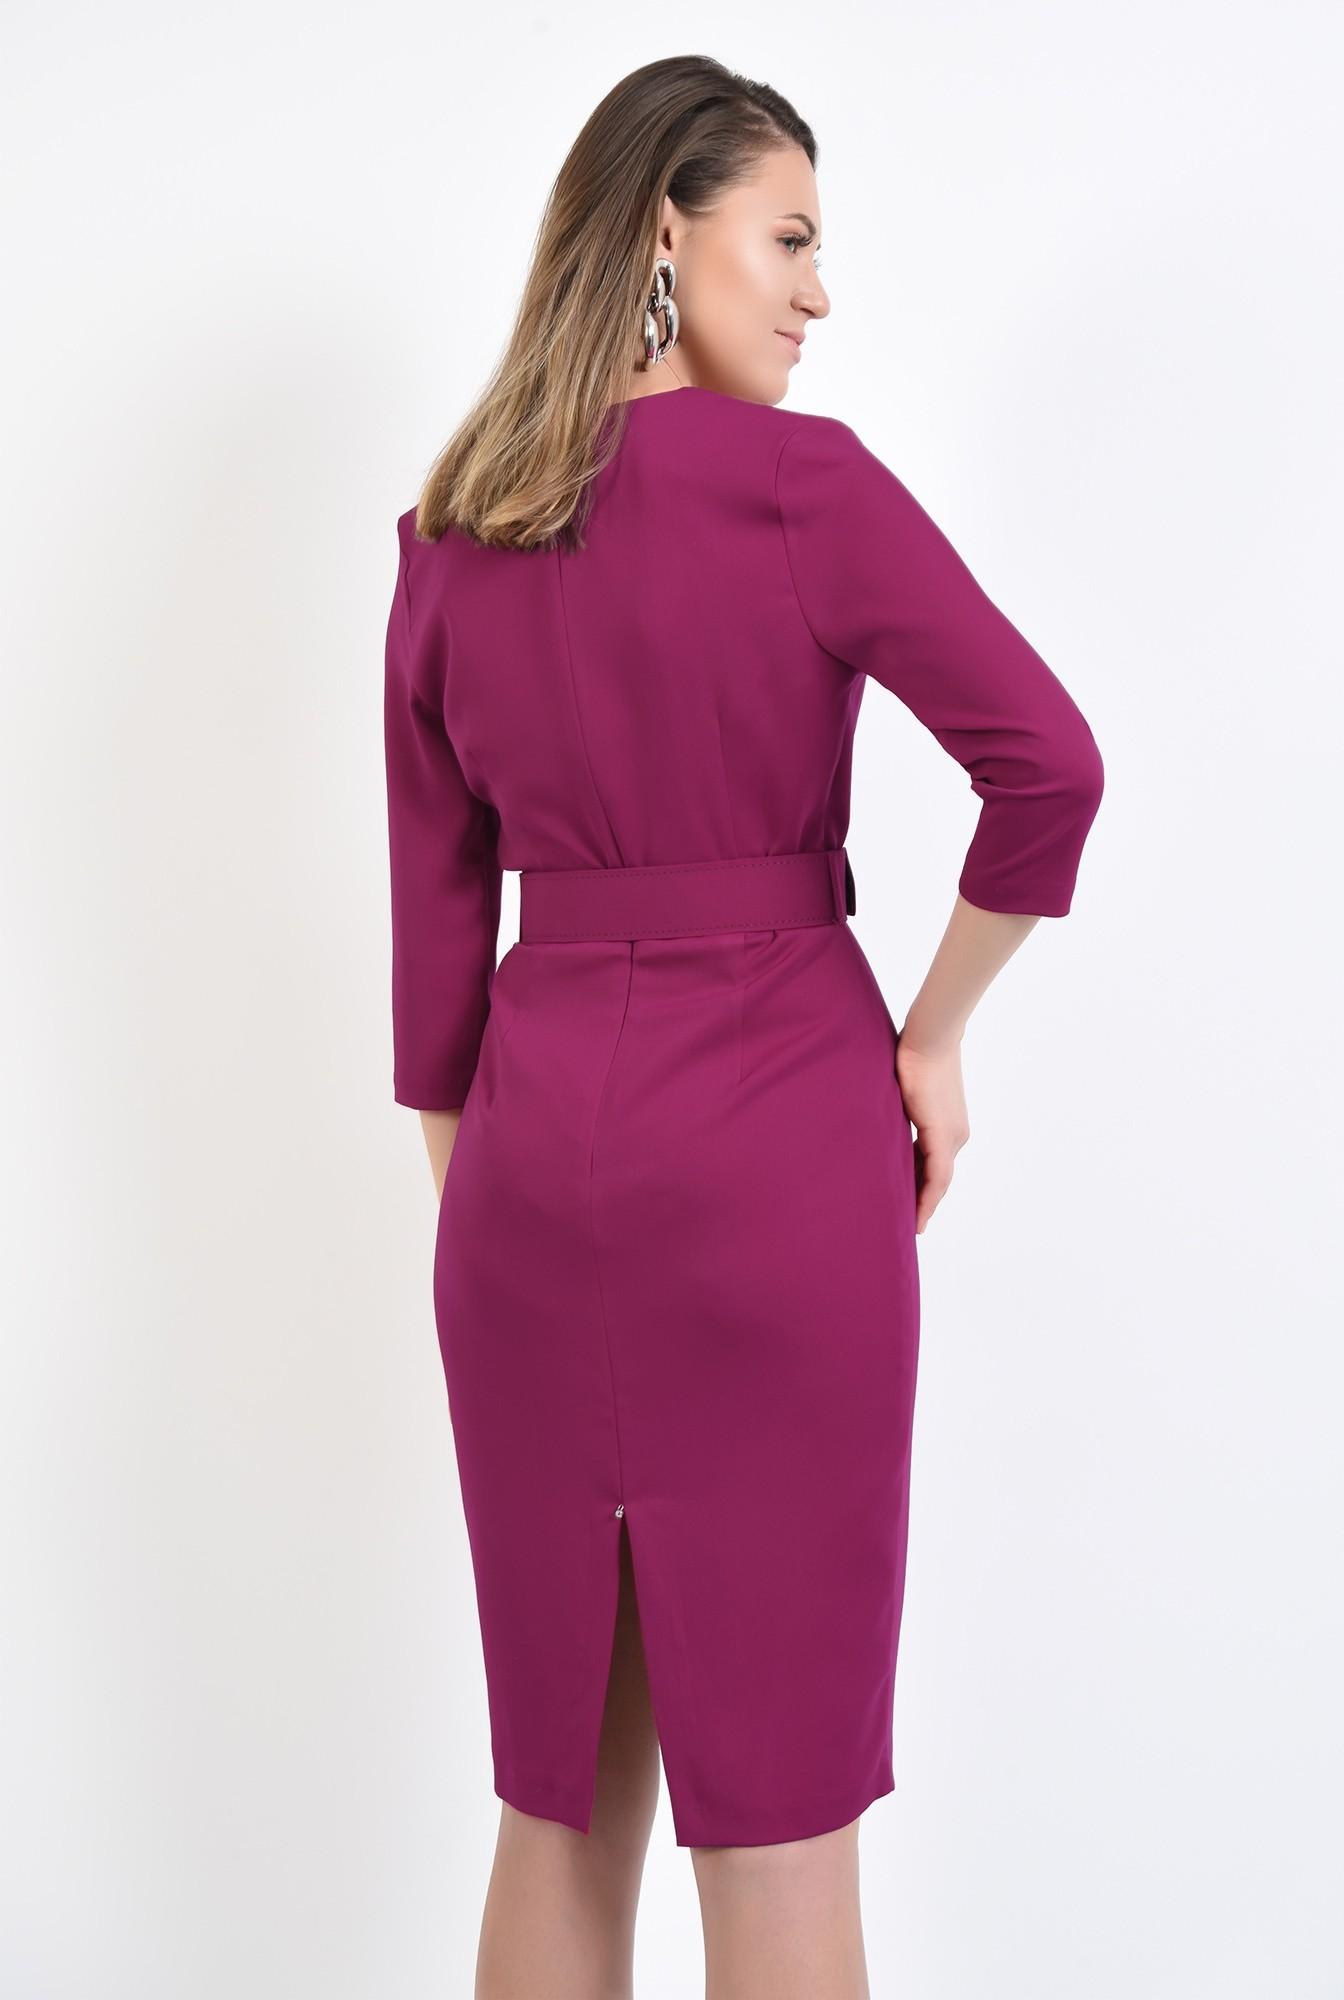 1 - 360 - rochie magenta, office, conica, cu centura